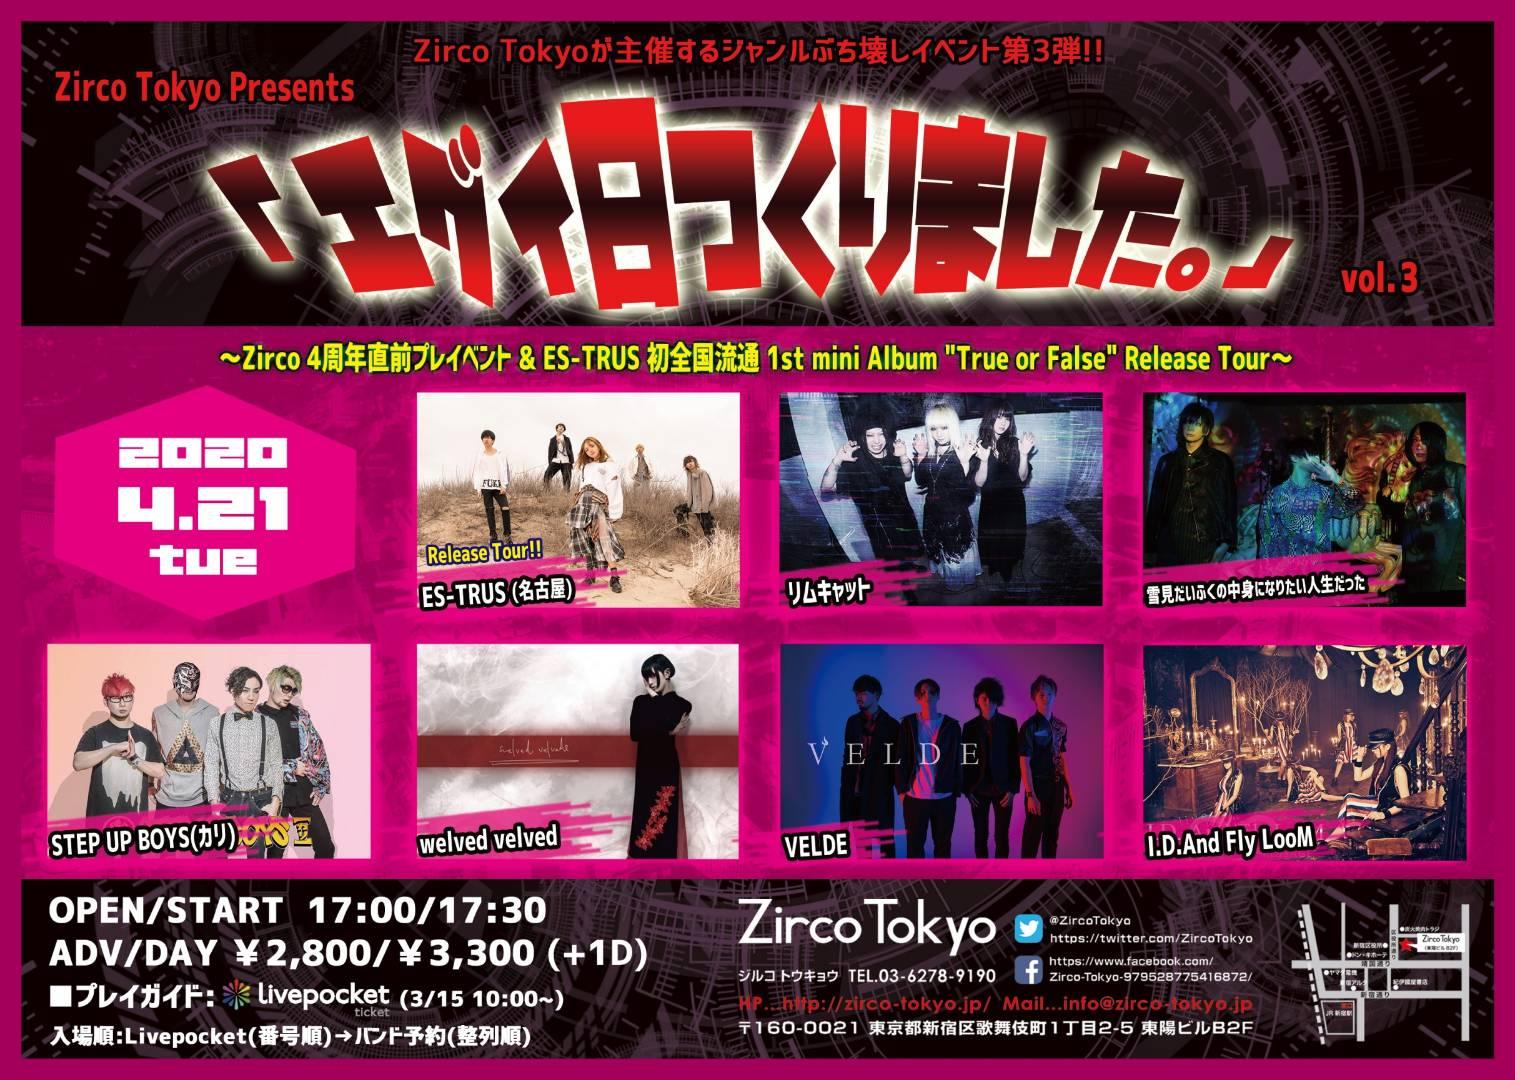 "Zirco Tokyo Presents 『エグイ日つくりました。』 vol.3 ~Zirco 4周年直前プレイベント & ES-TRUS 初全国流通 1st mini Album ""True or False"" Release Tour~"